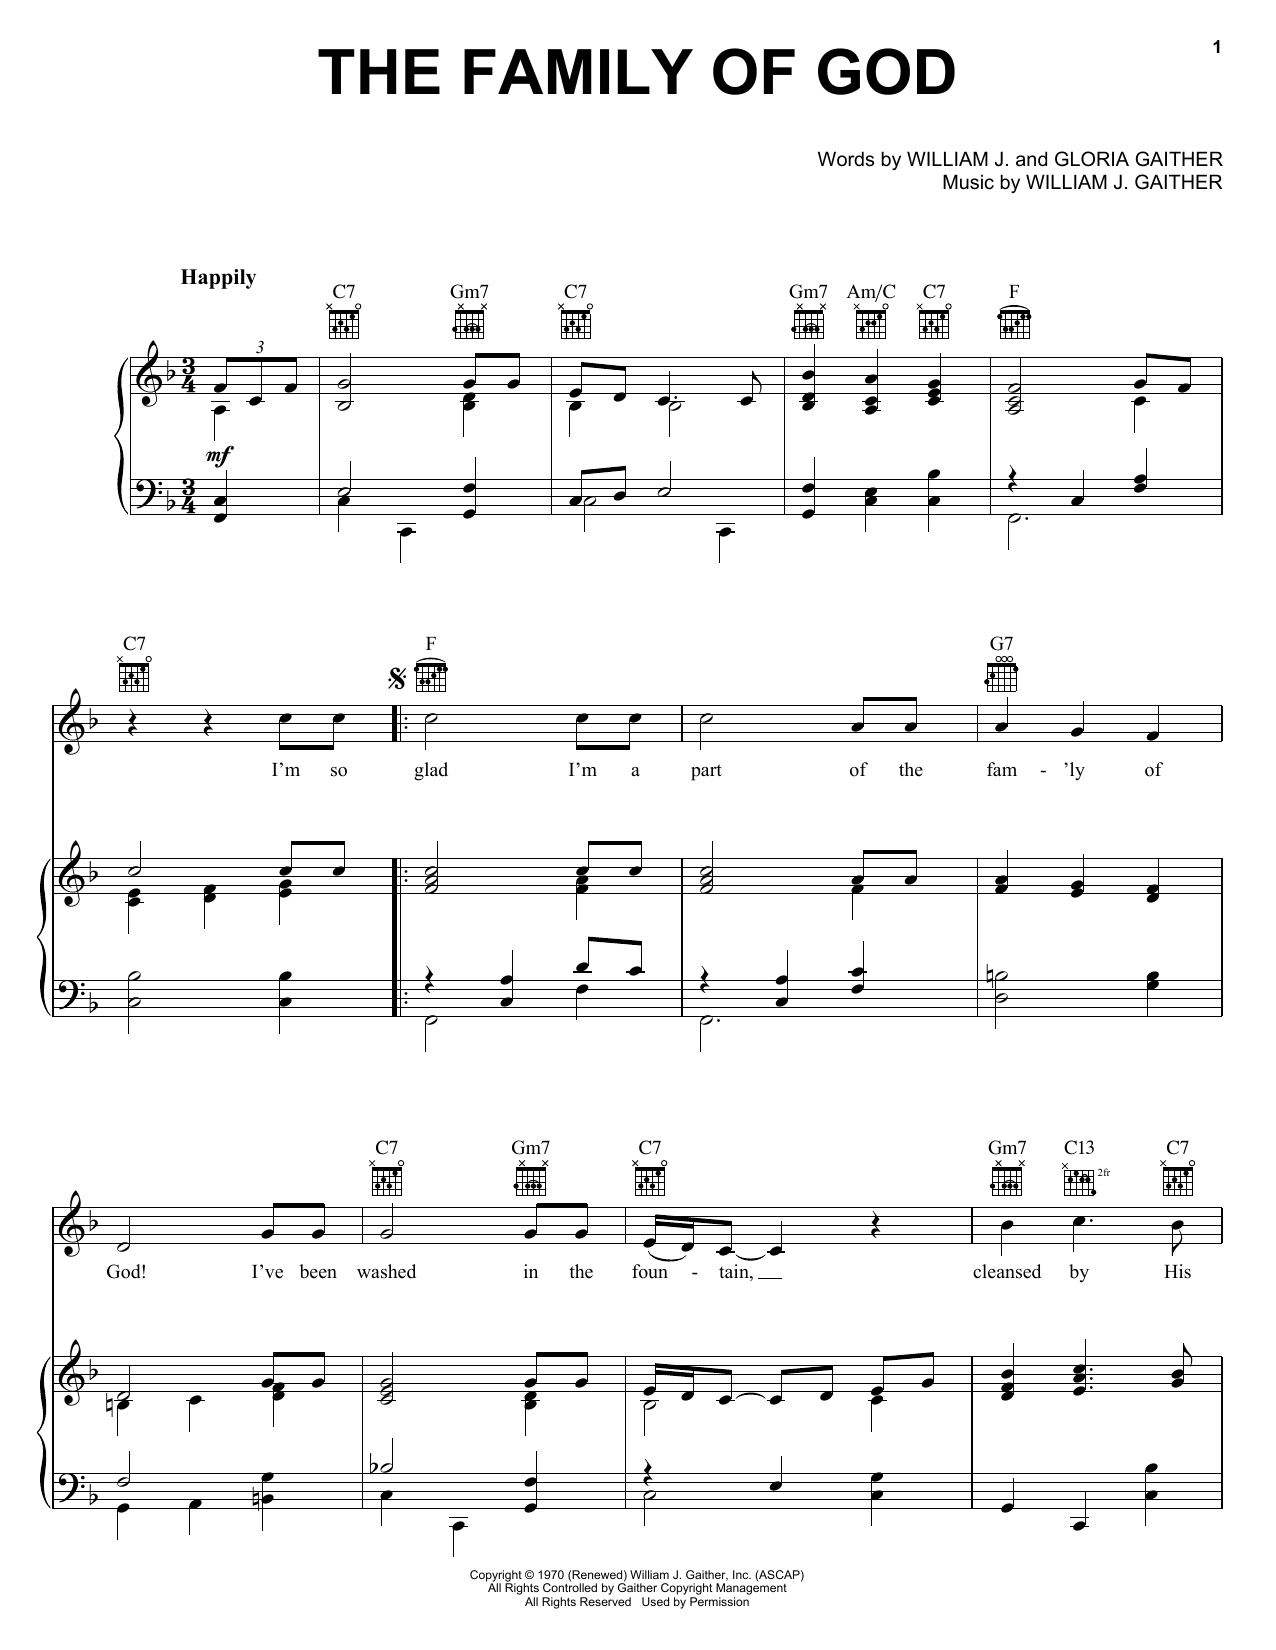 Bill Gaither - The Family of God Lyrics - elyricsworld.com